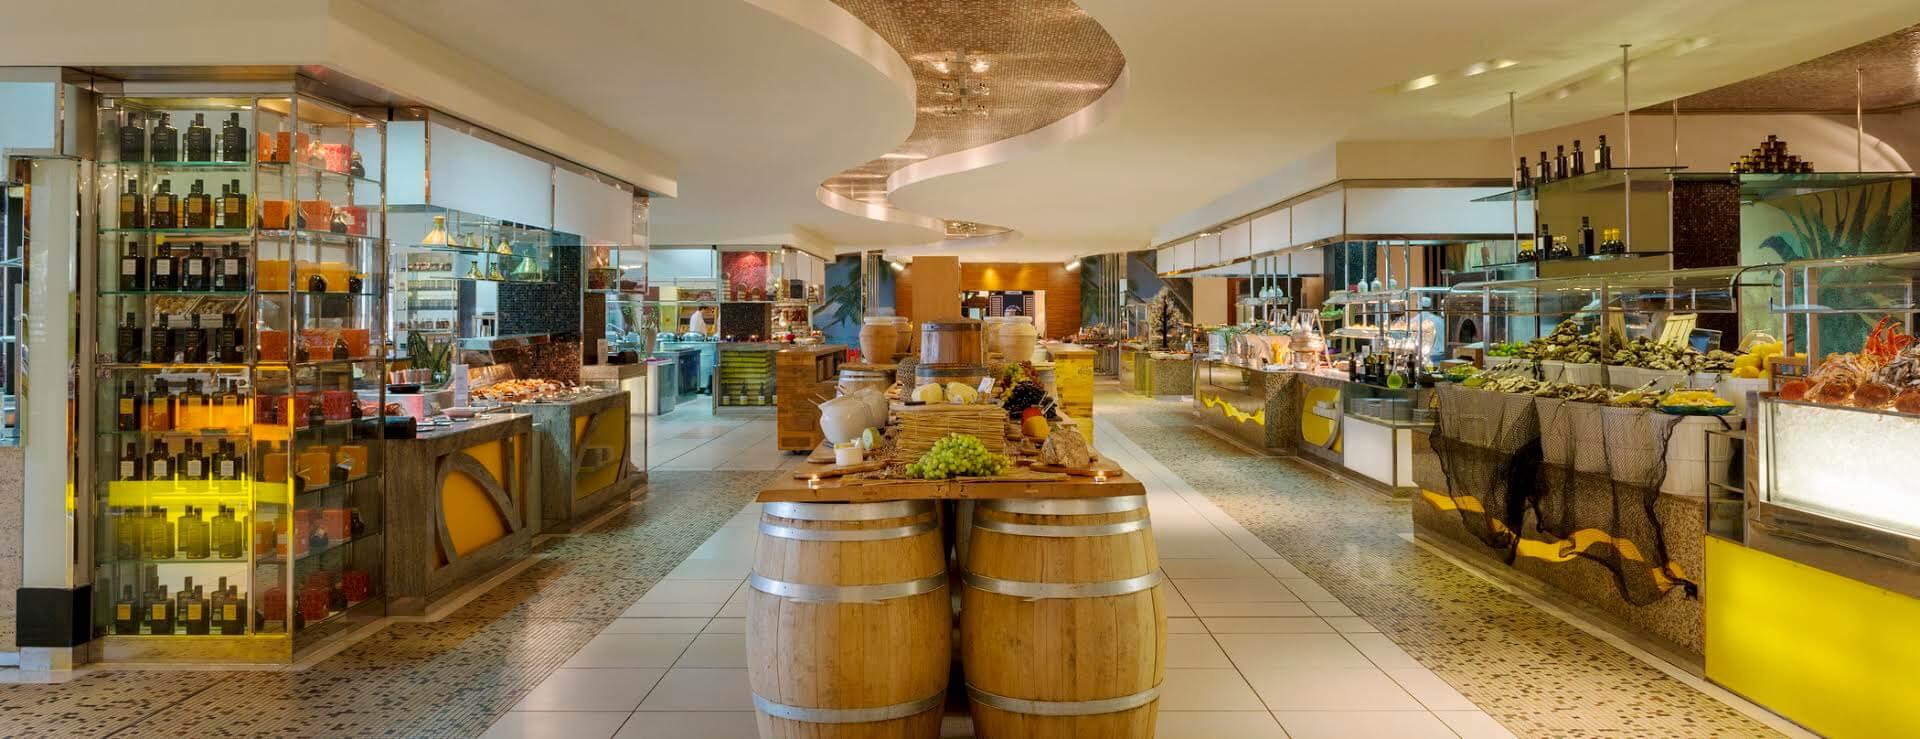 Photo of عروض مطاعم فندق ويستن دبي الميناء السياحي خلال رمضان 2017